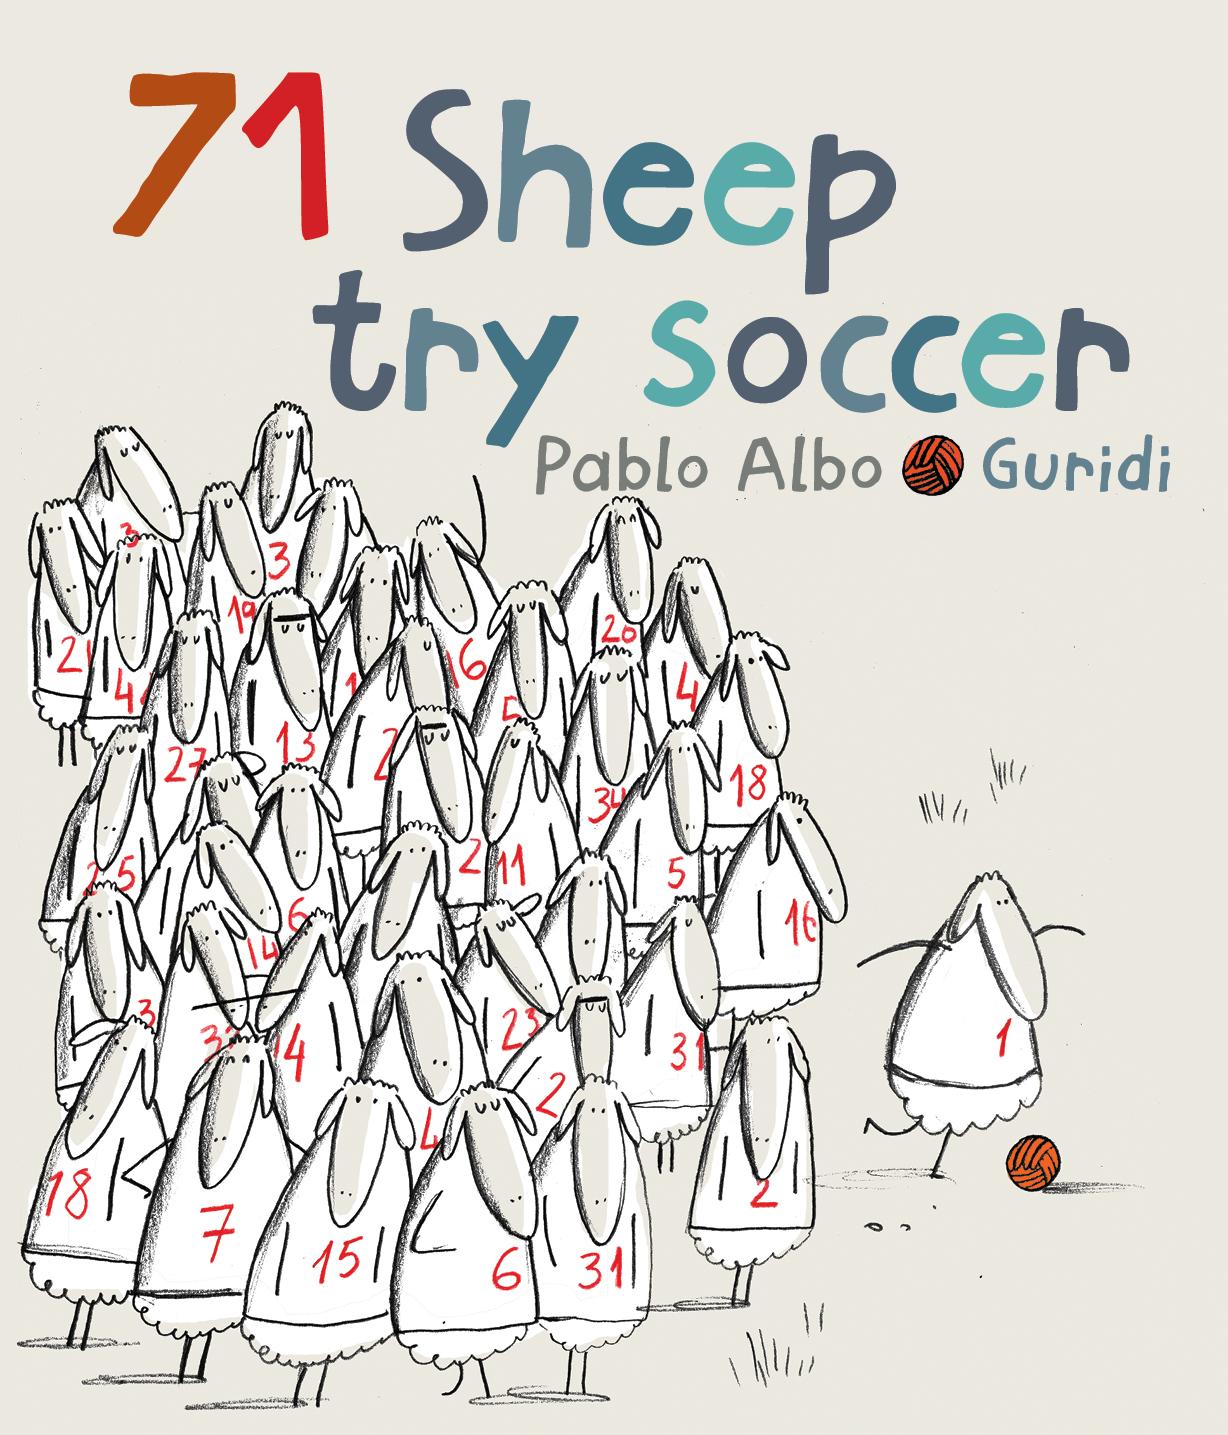 71 sheep cover.jpg